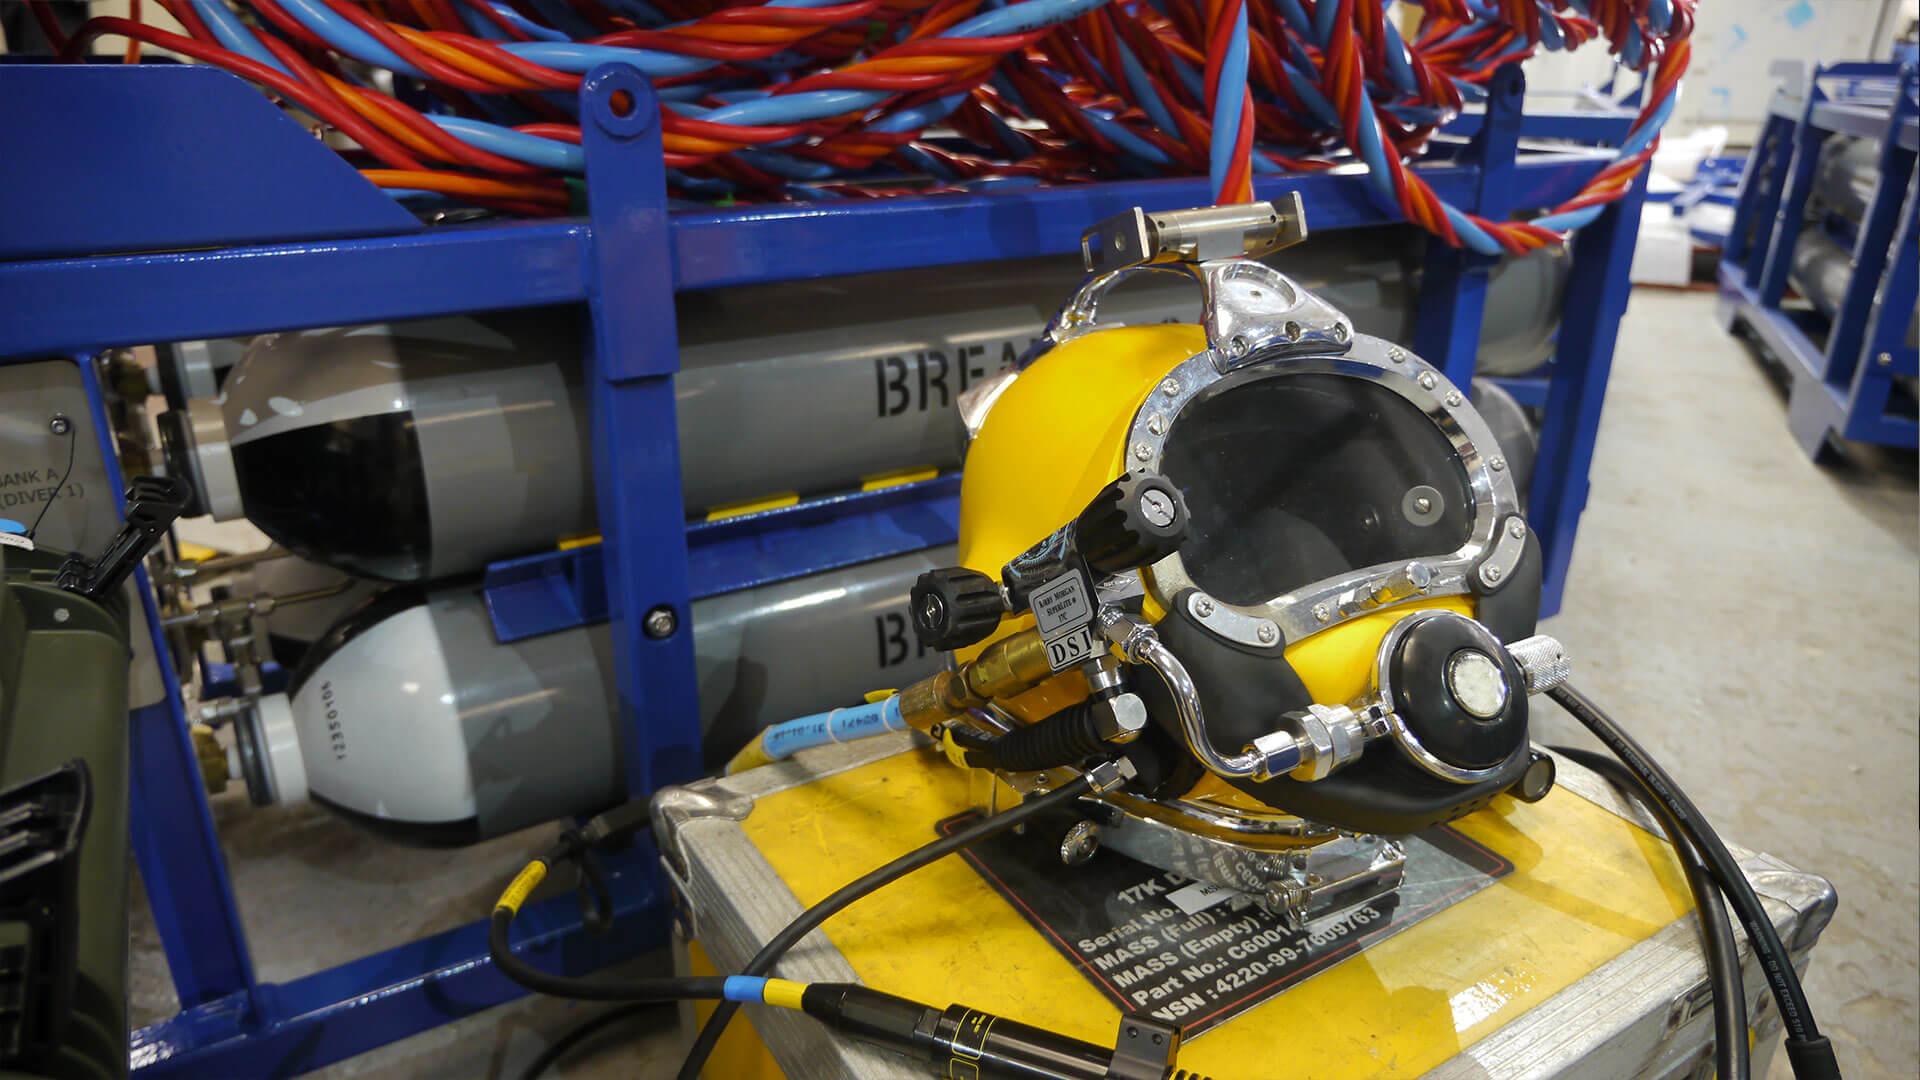 Scuba Replacement Package - commercial diving helmet